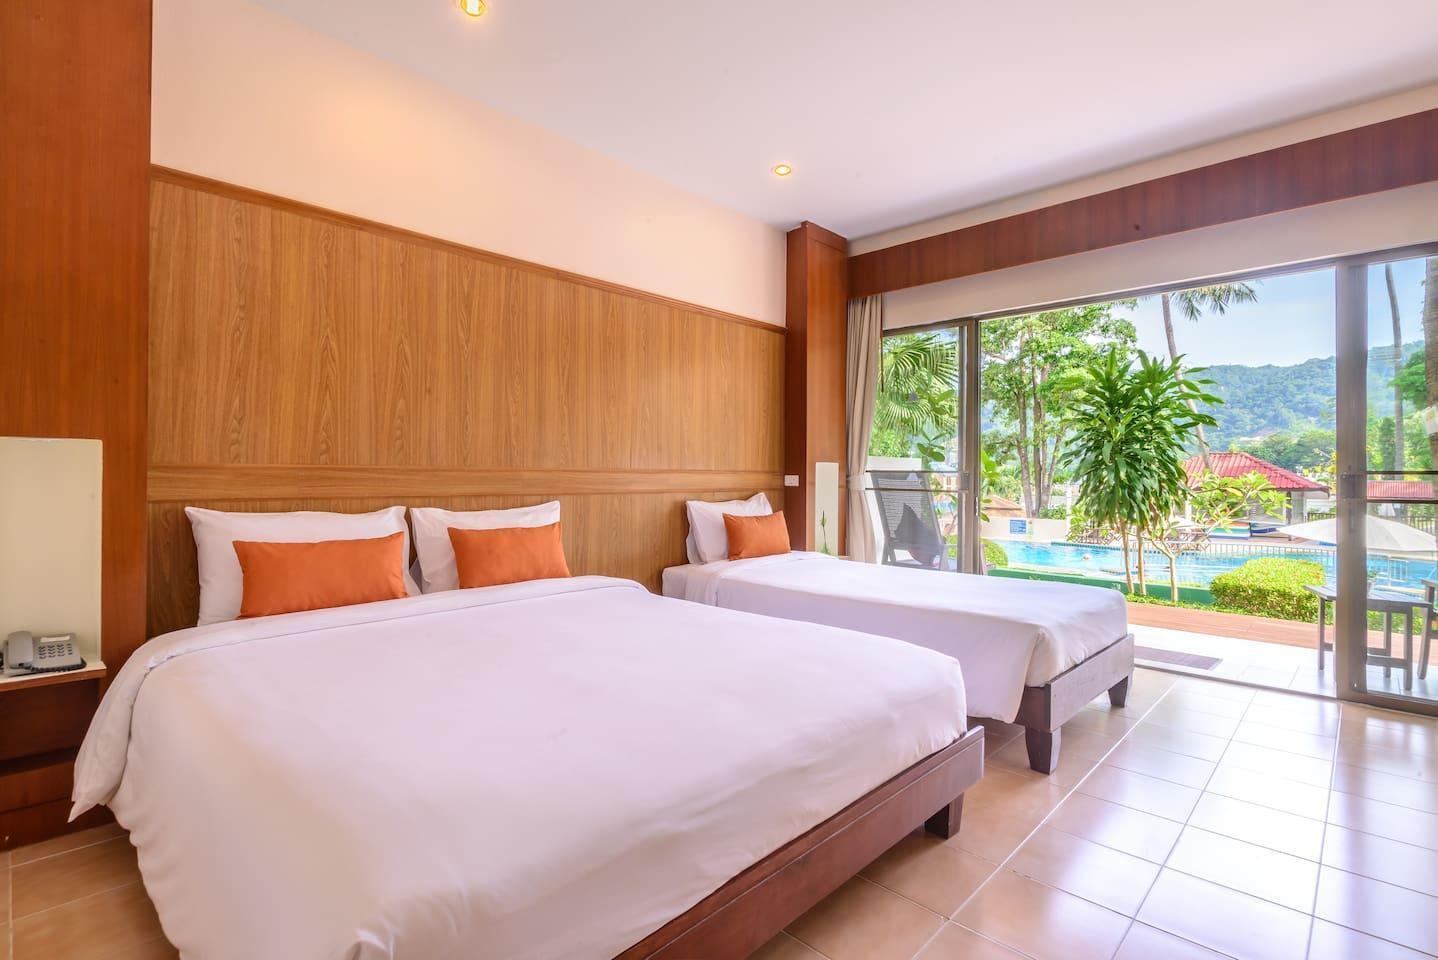 Triple room with directly access to swimming pool2 1 ห้องนอน 1 ห้องน้ำส่วนตัว ขนาด 35 ตร.ม. – ป่าตอง